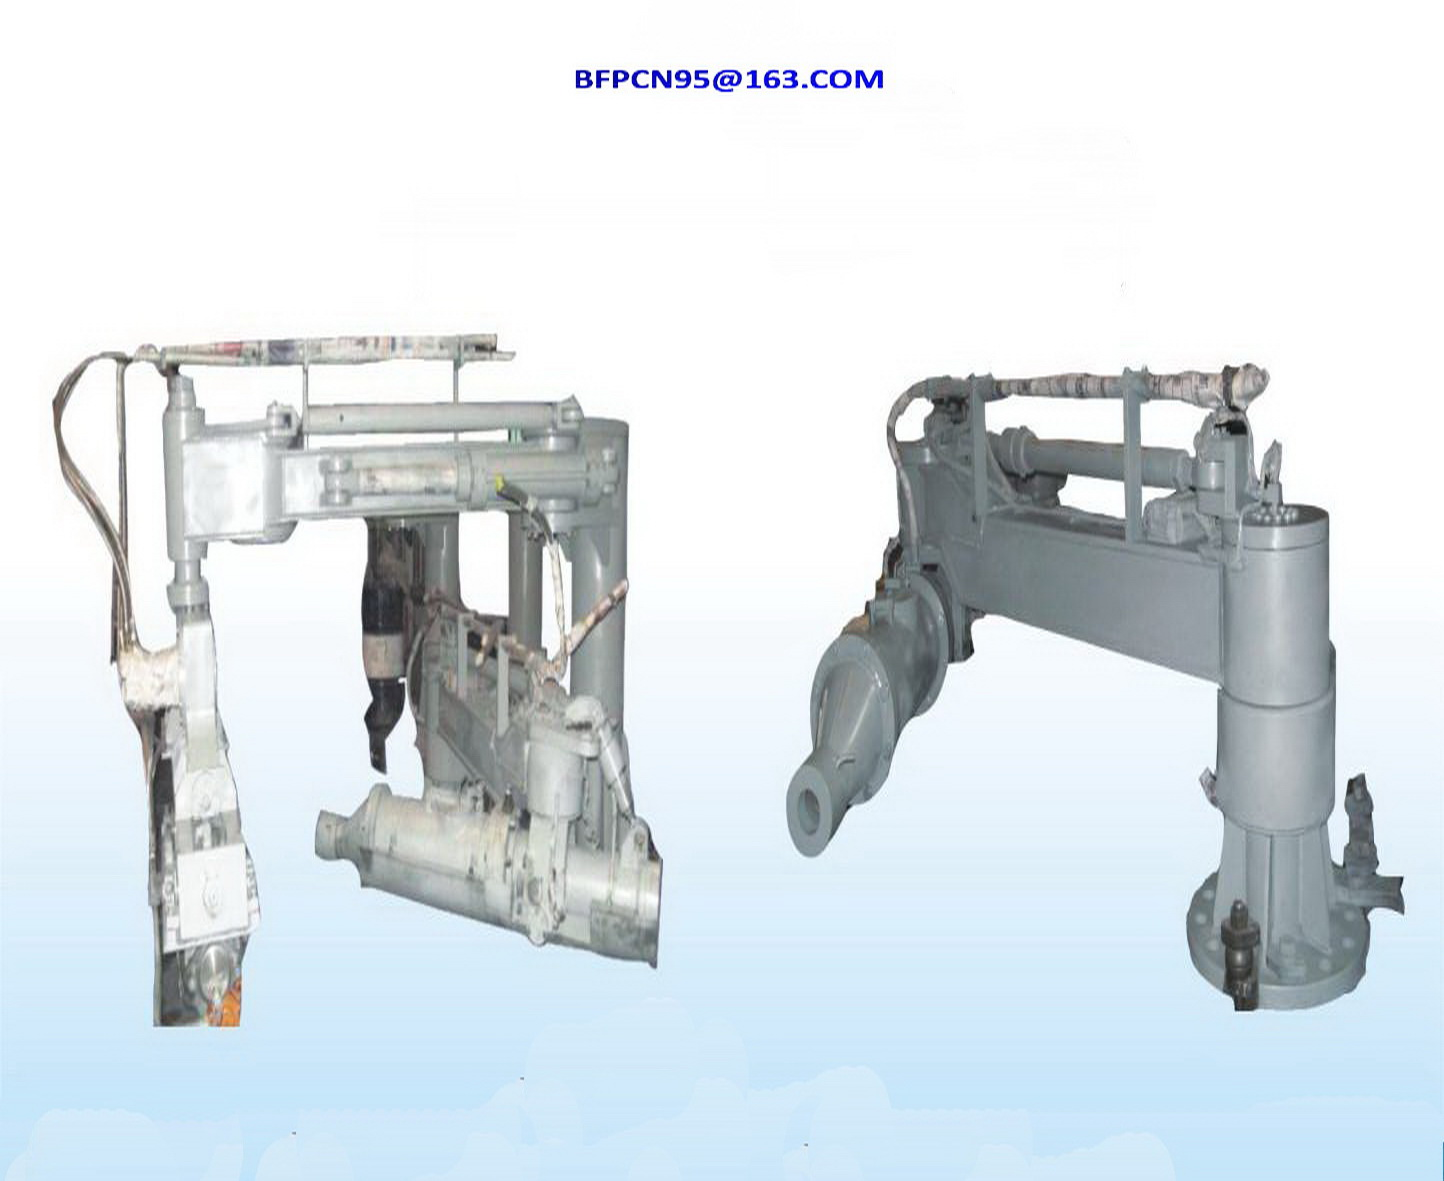 Iron notch drill